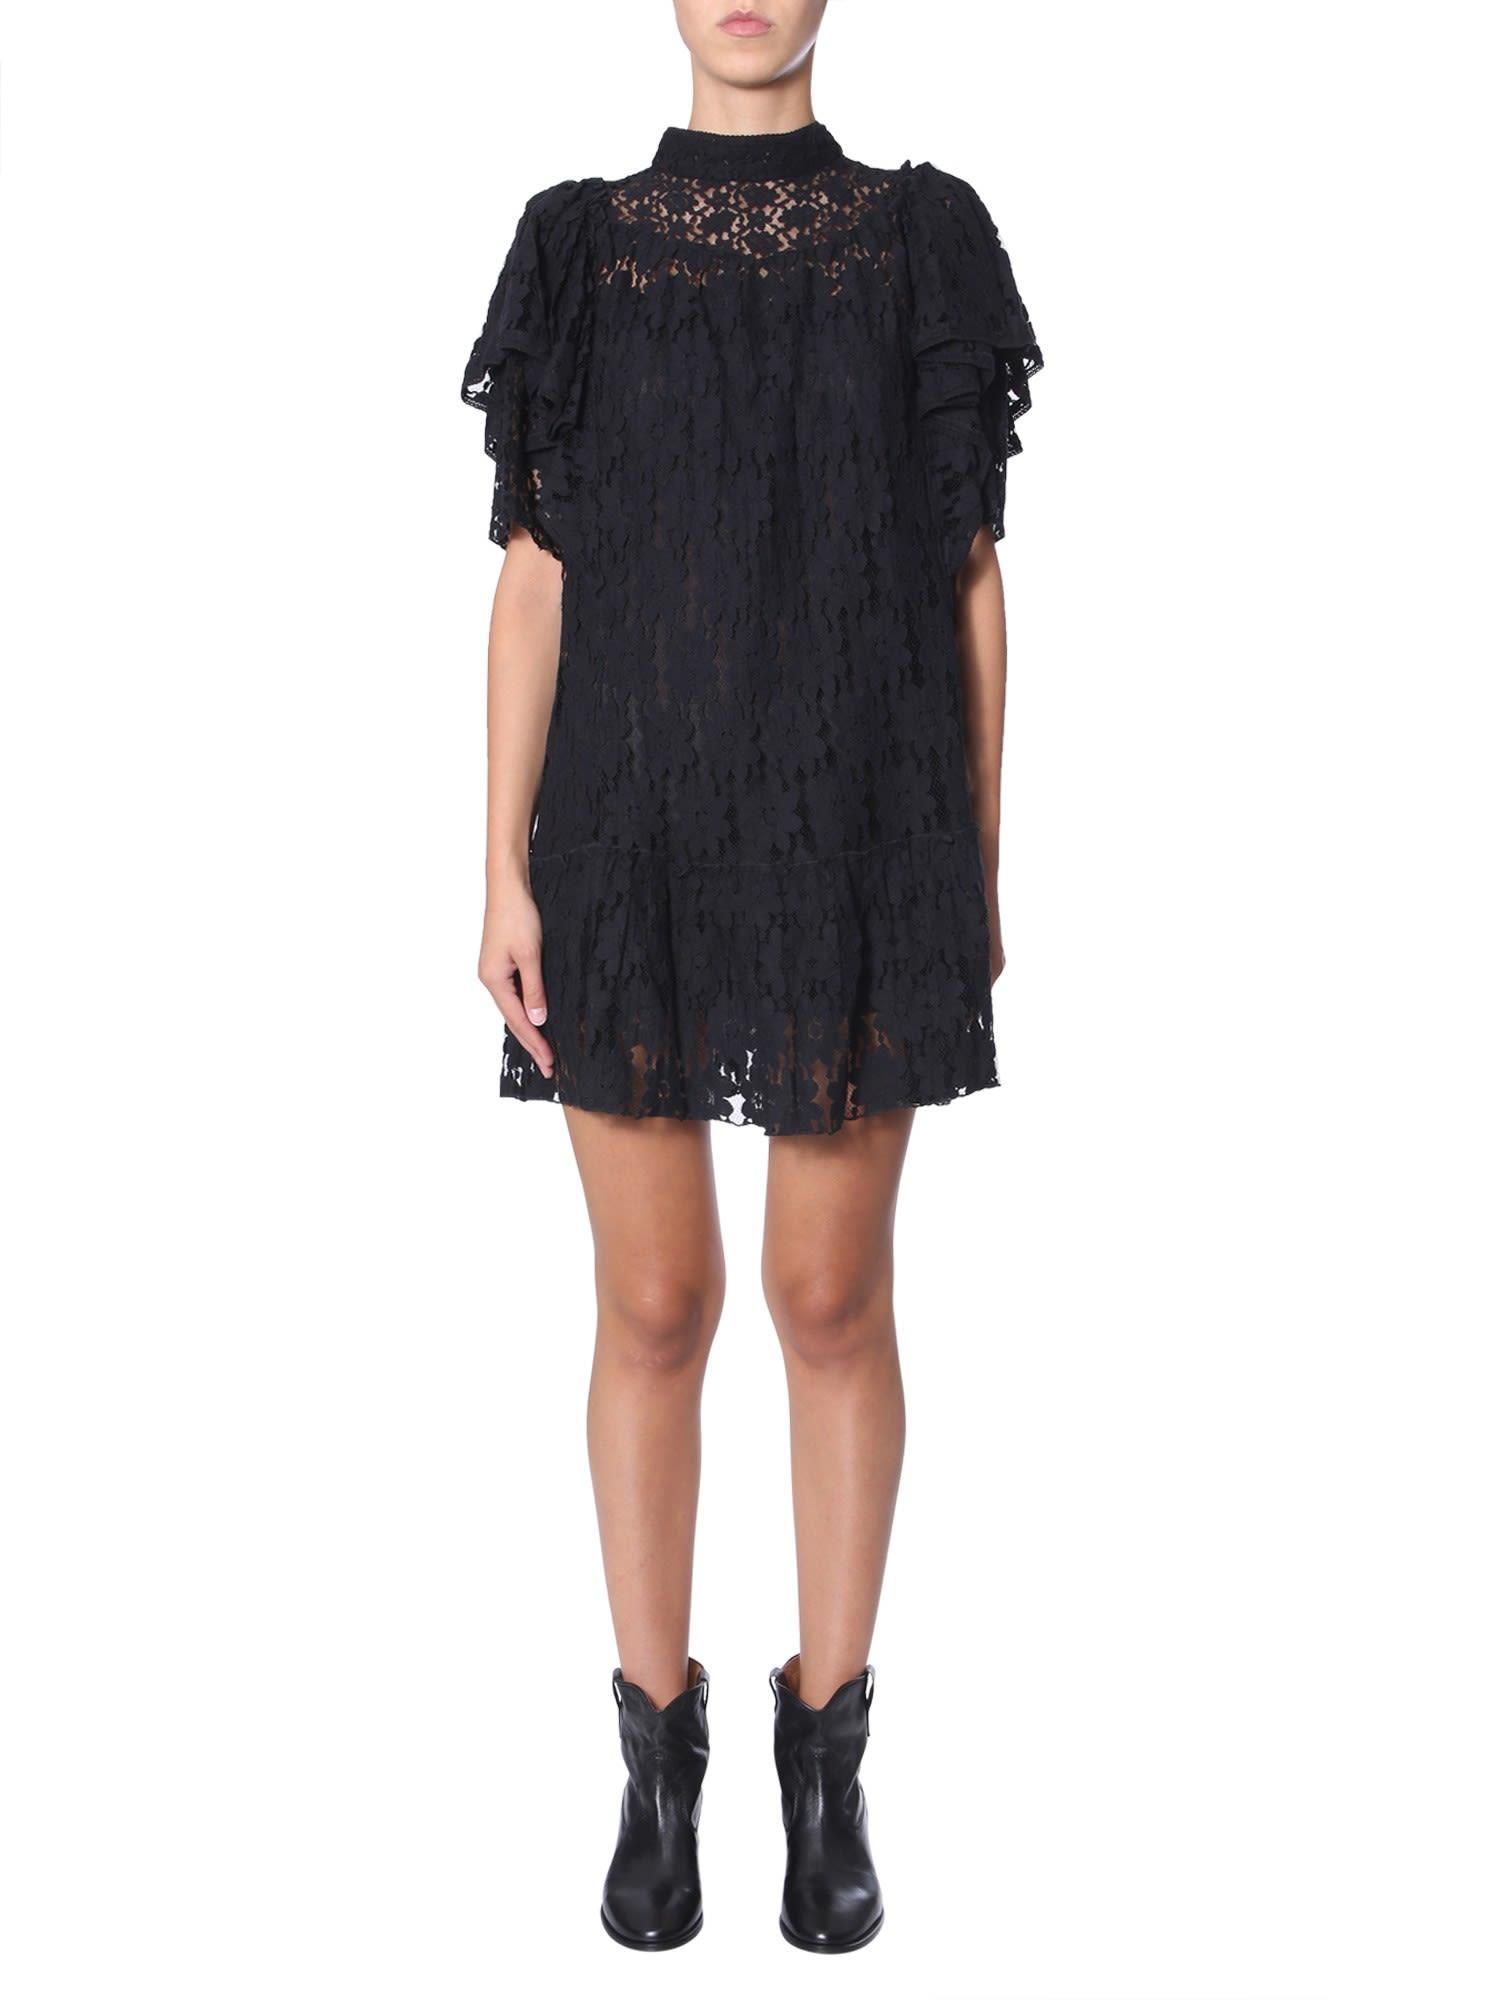 Isabel Marant Étoile Venus Dress